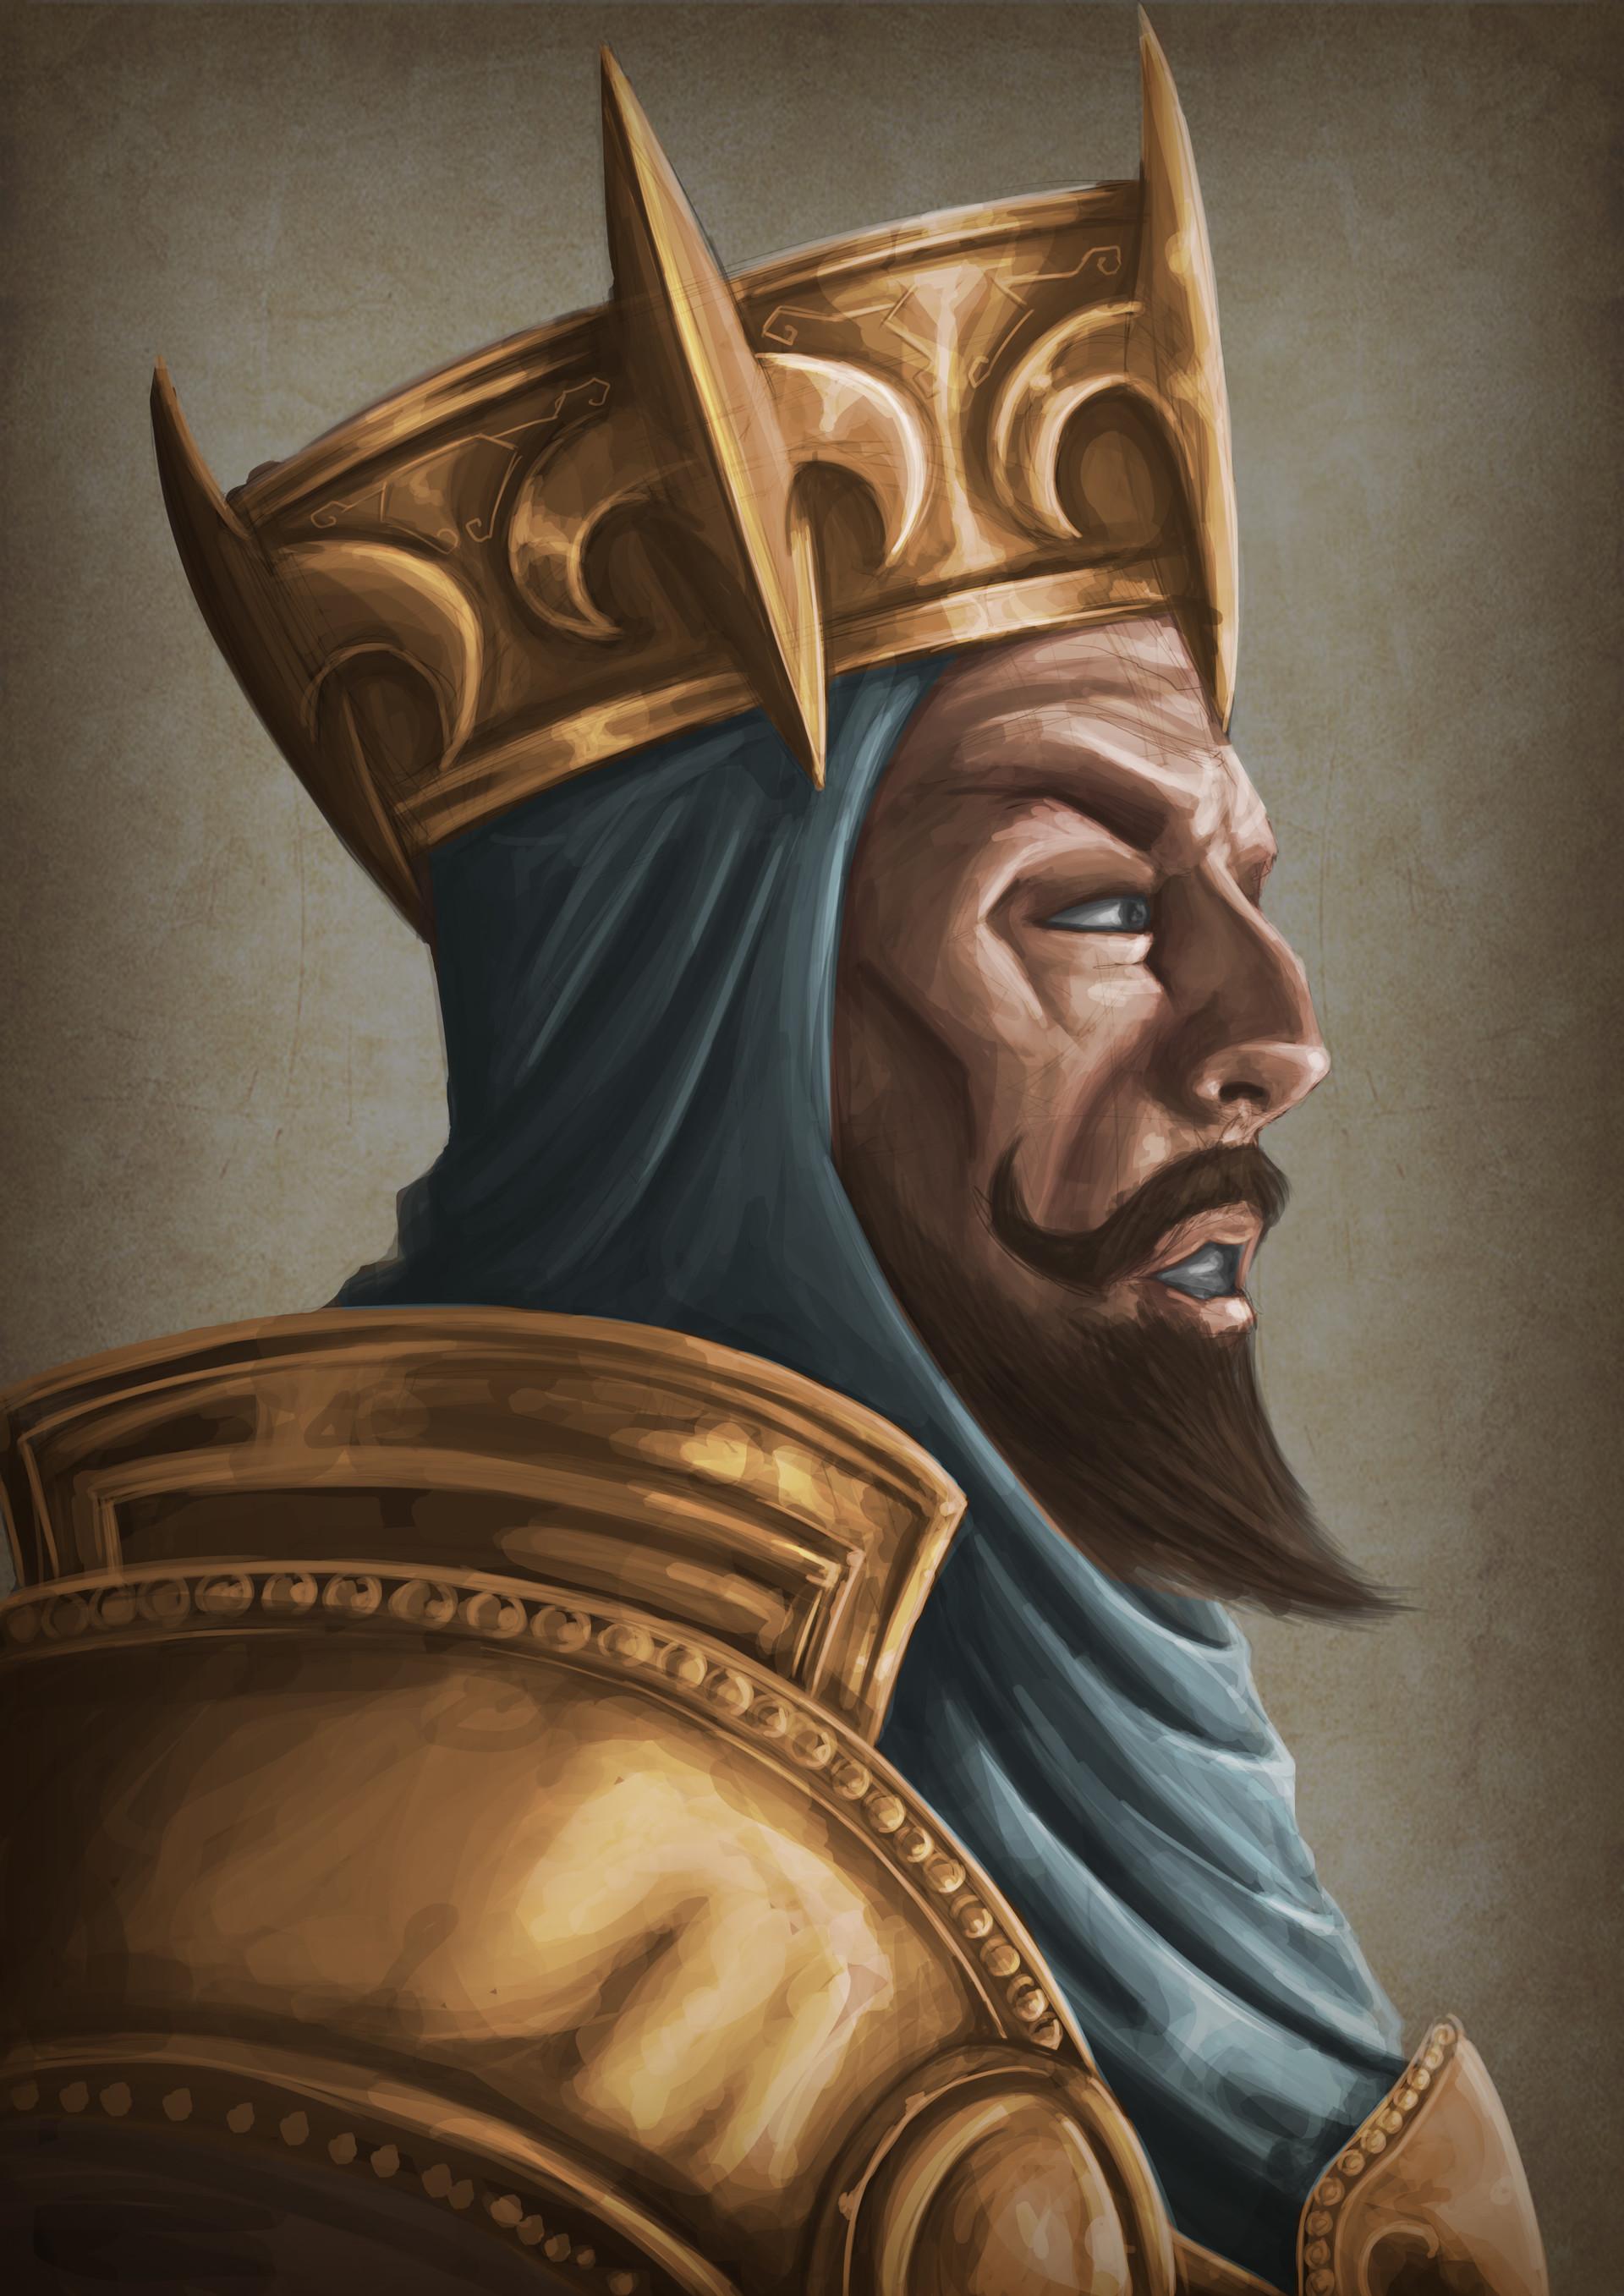 jules-thavenet-king.jpg?1535921726